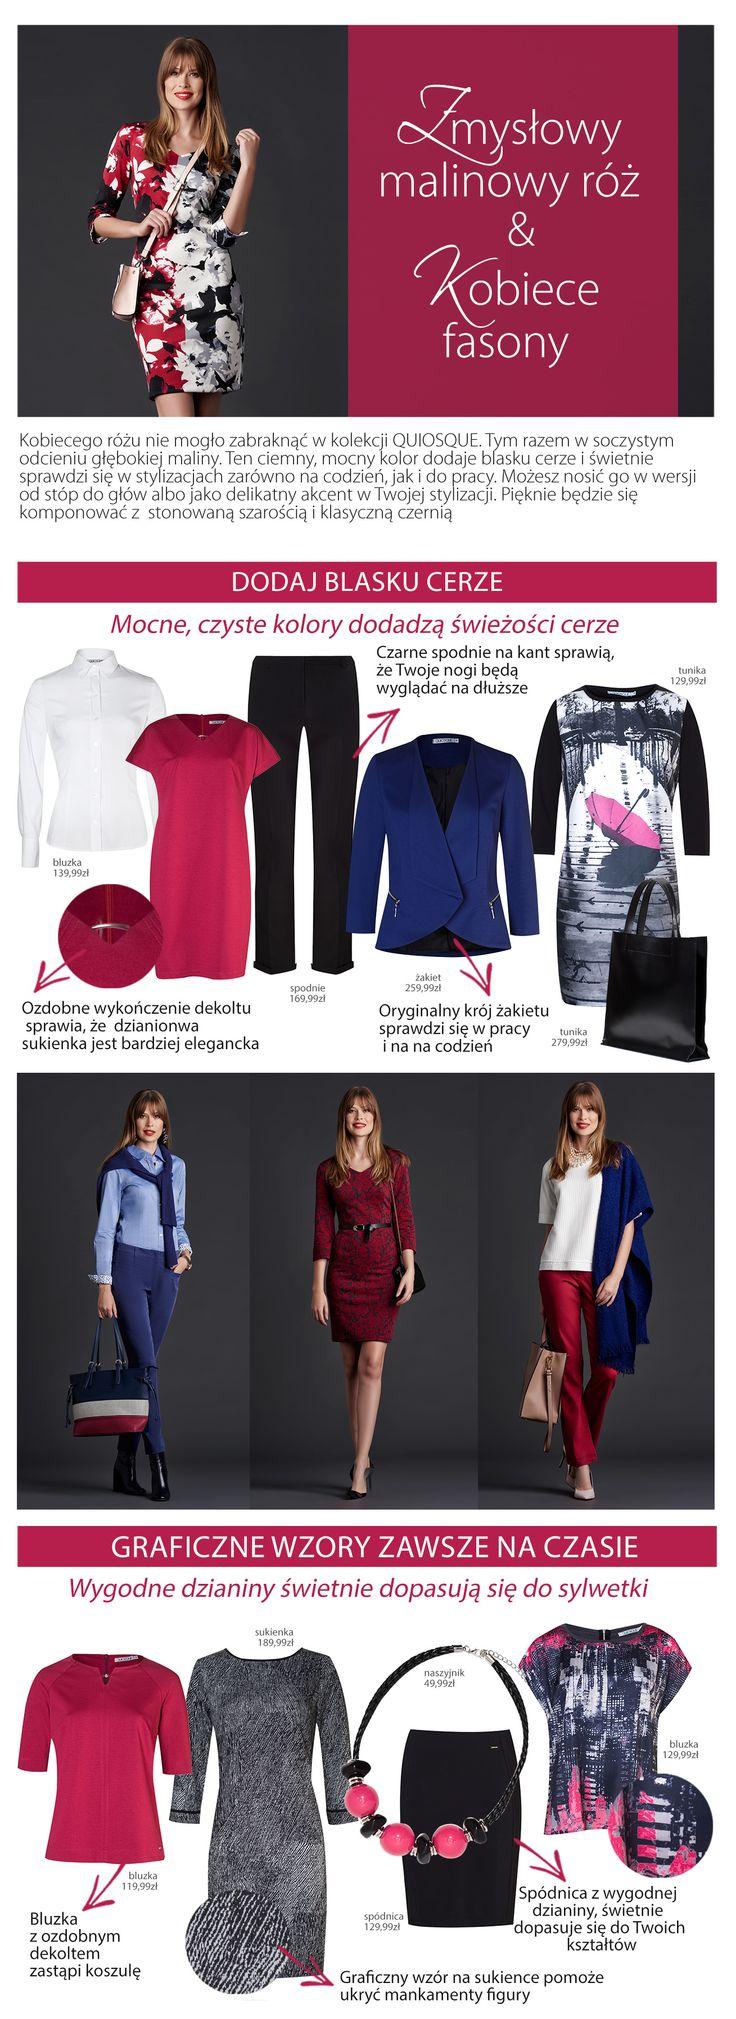 #quiosquepl #quiosque #naszeinspiracje #poniedzialek #monday #new #collection #lady #style #kolory #details #klasyka #colour #colourful #dress #bag #blouse #trousers #jacket #feminine #kobieco #nadruk #womanwear #trends #inspirations